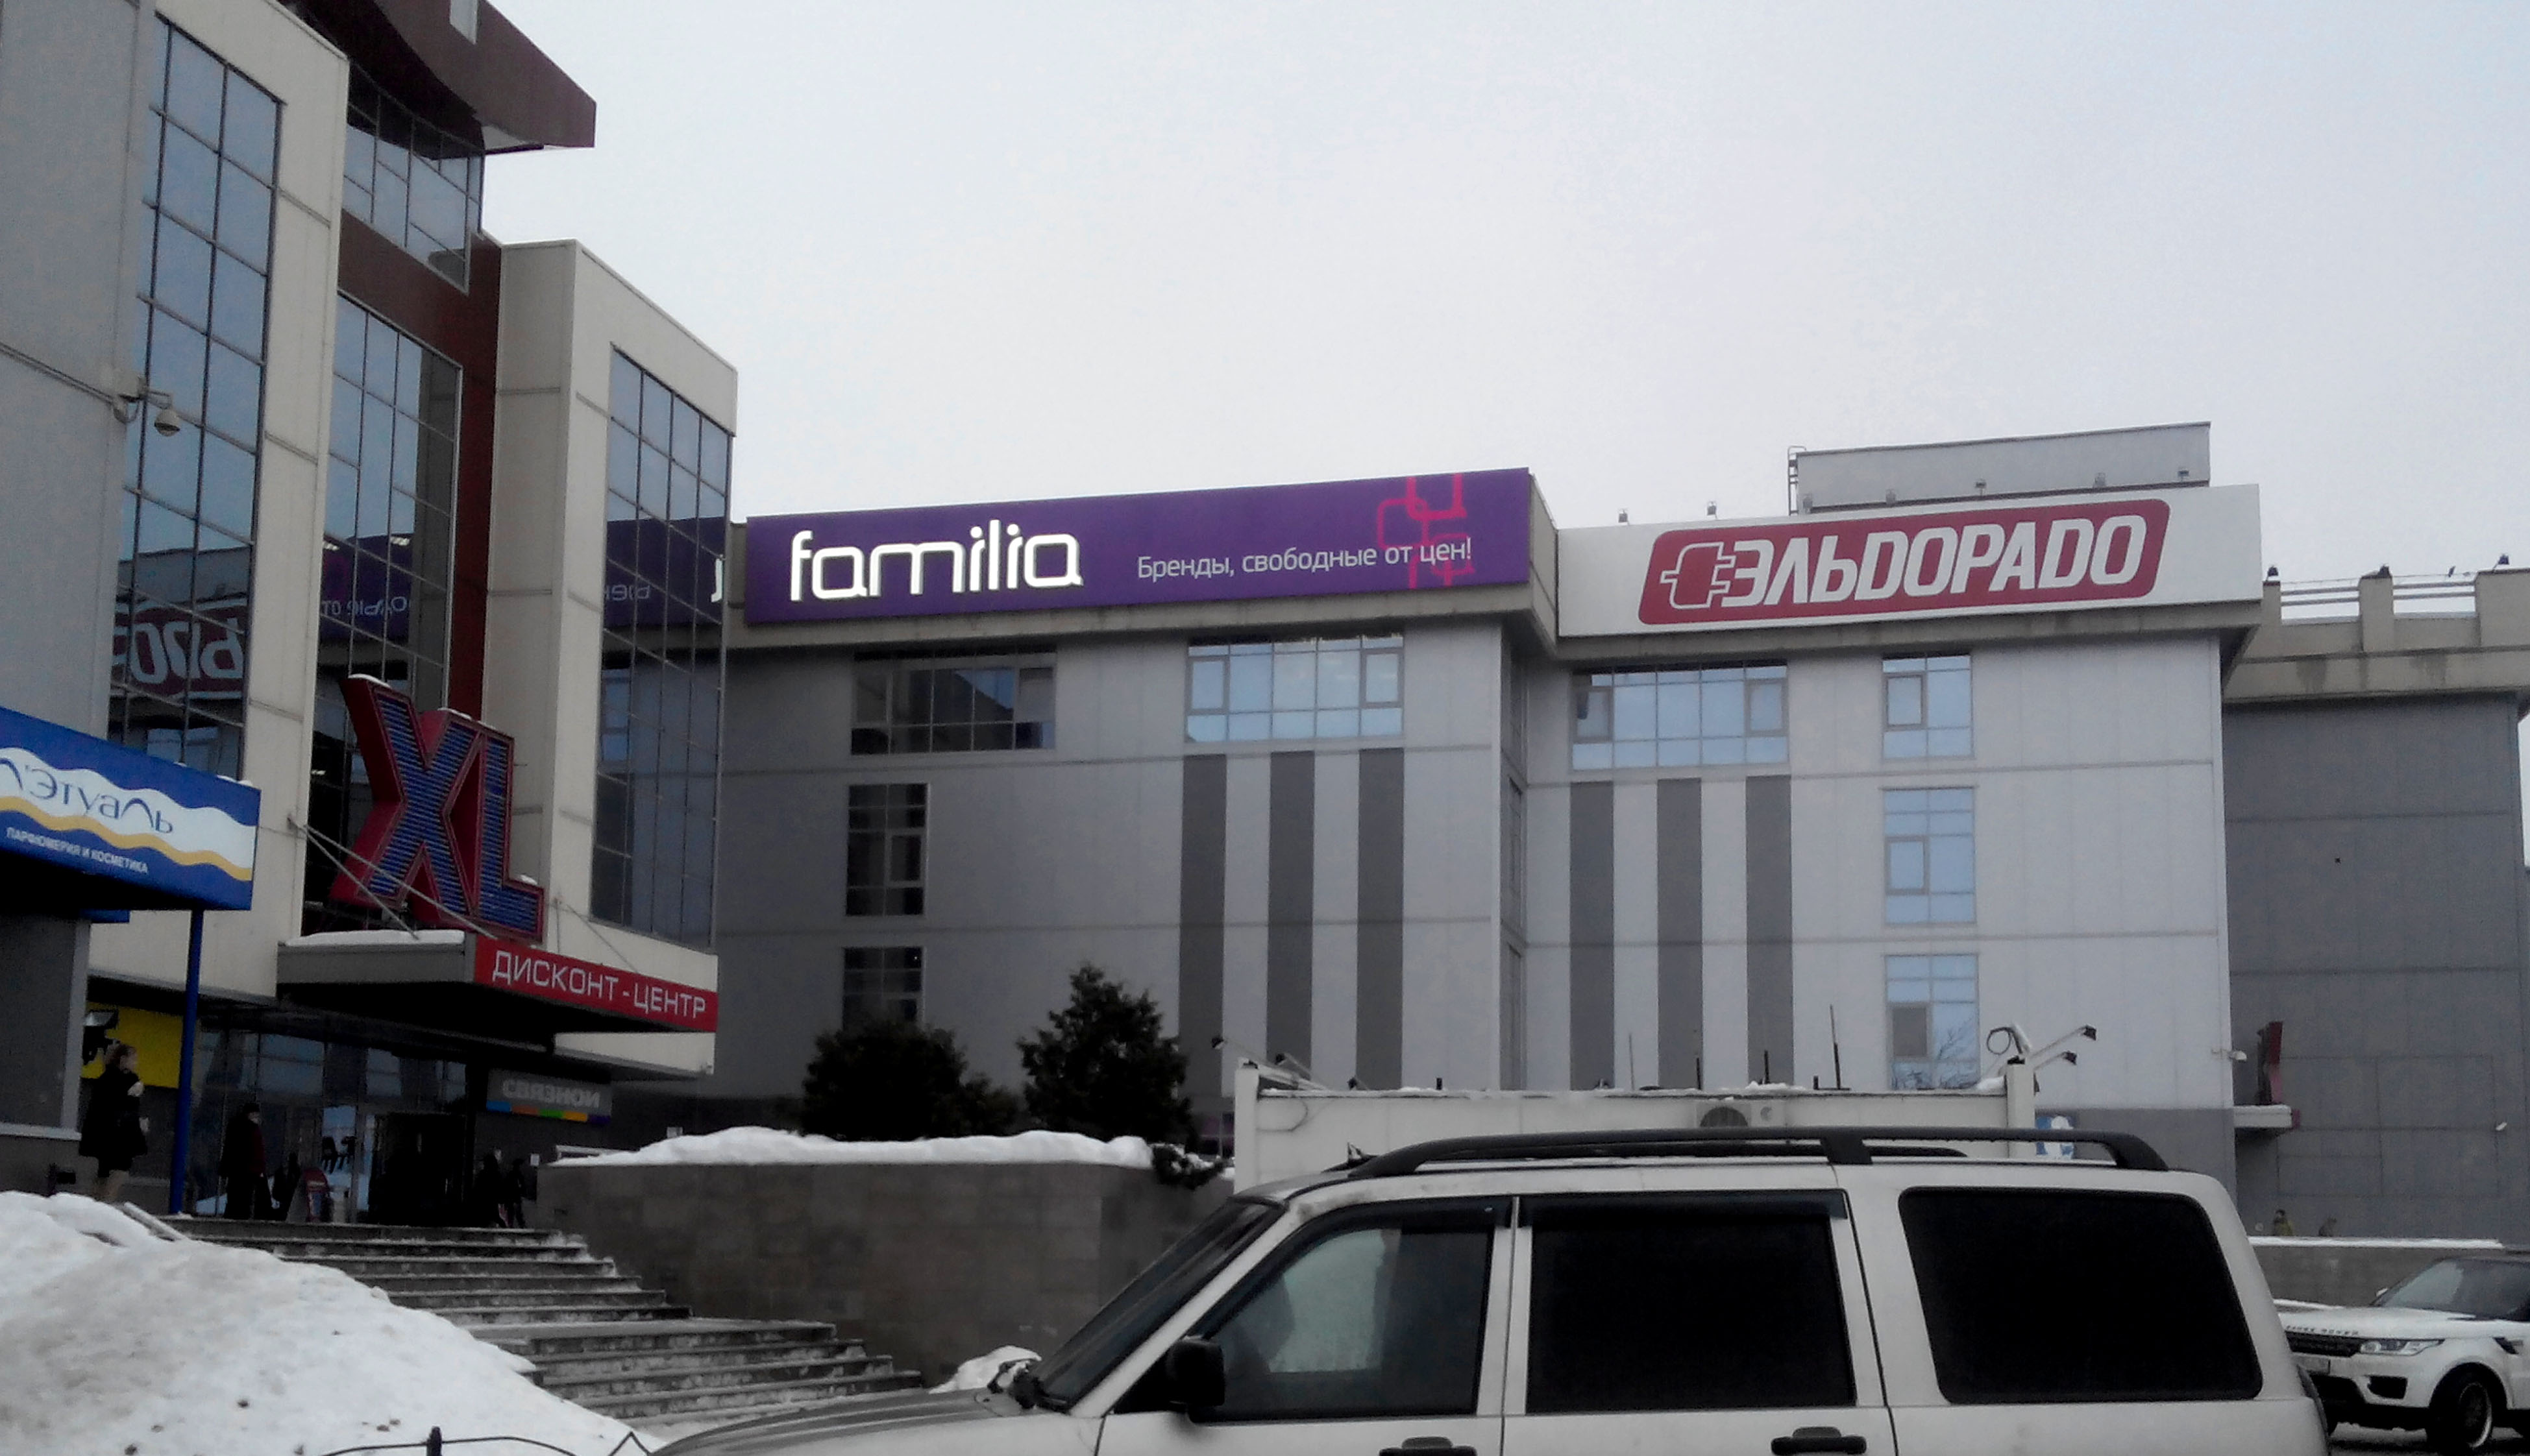 Оформление семейного универмага «Фамилия» в ТЦ «XL» в Казани